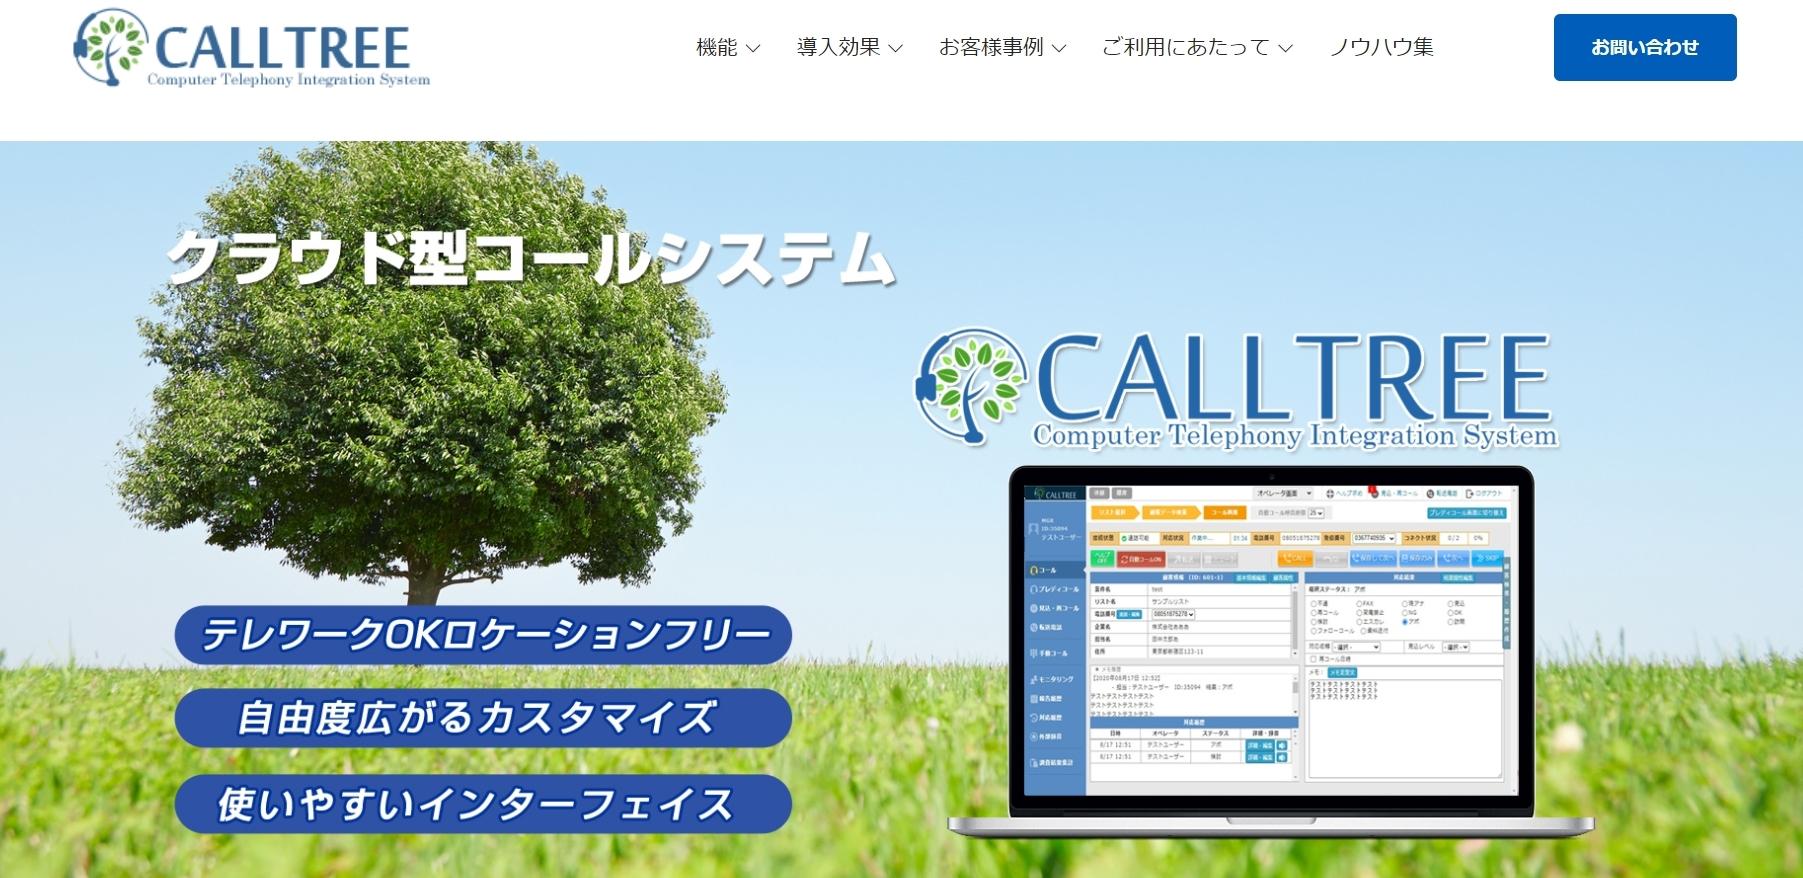 CALLTREE公式Webサイト